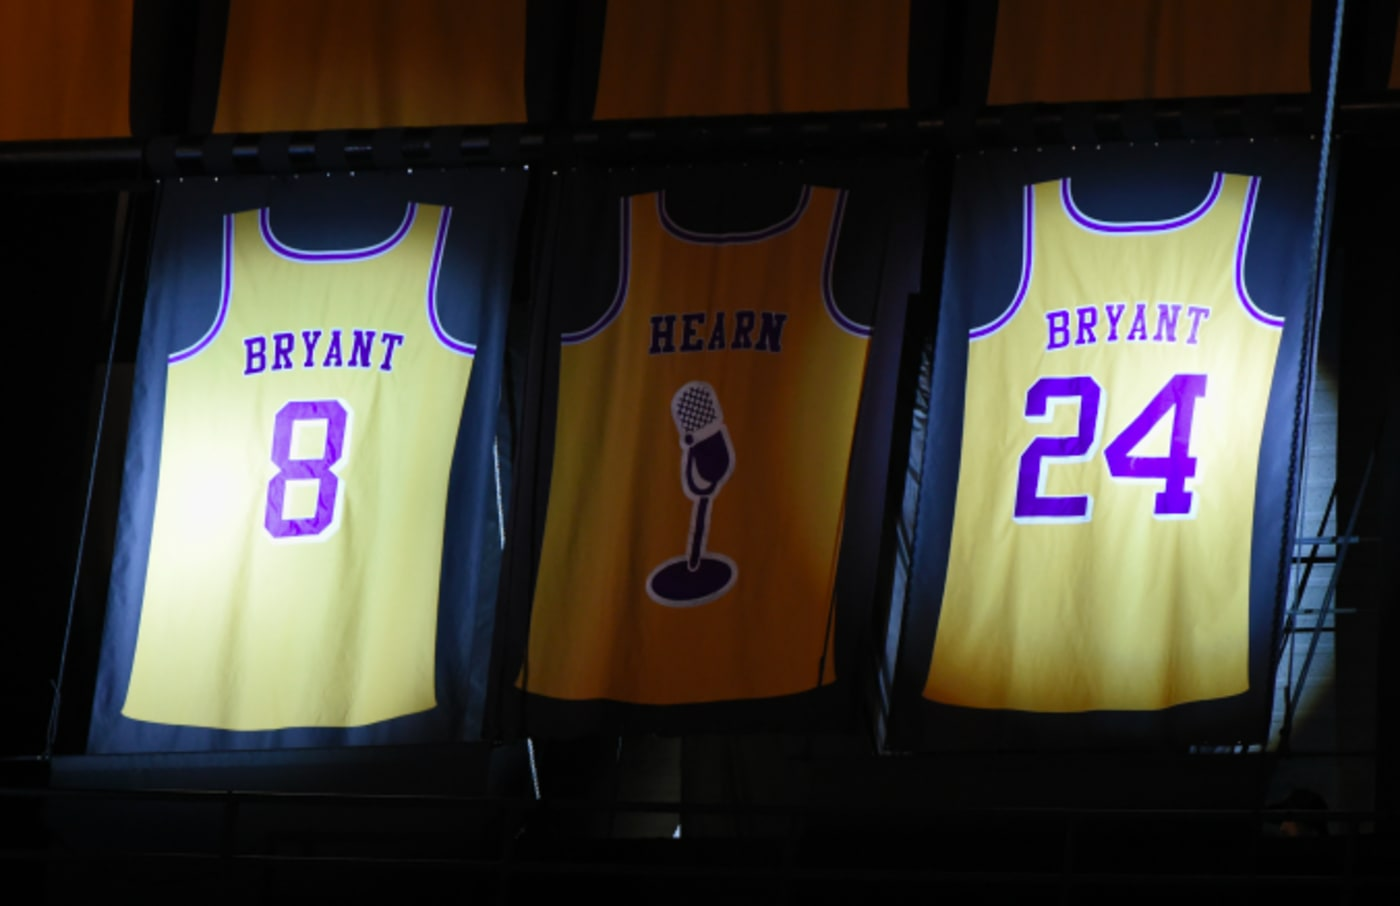 Kobe Bryant's jersey retirement ceremony